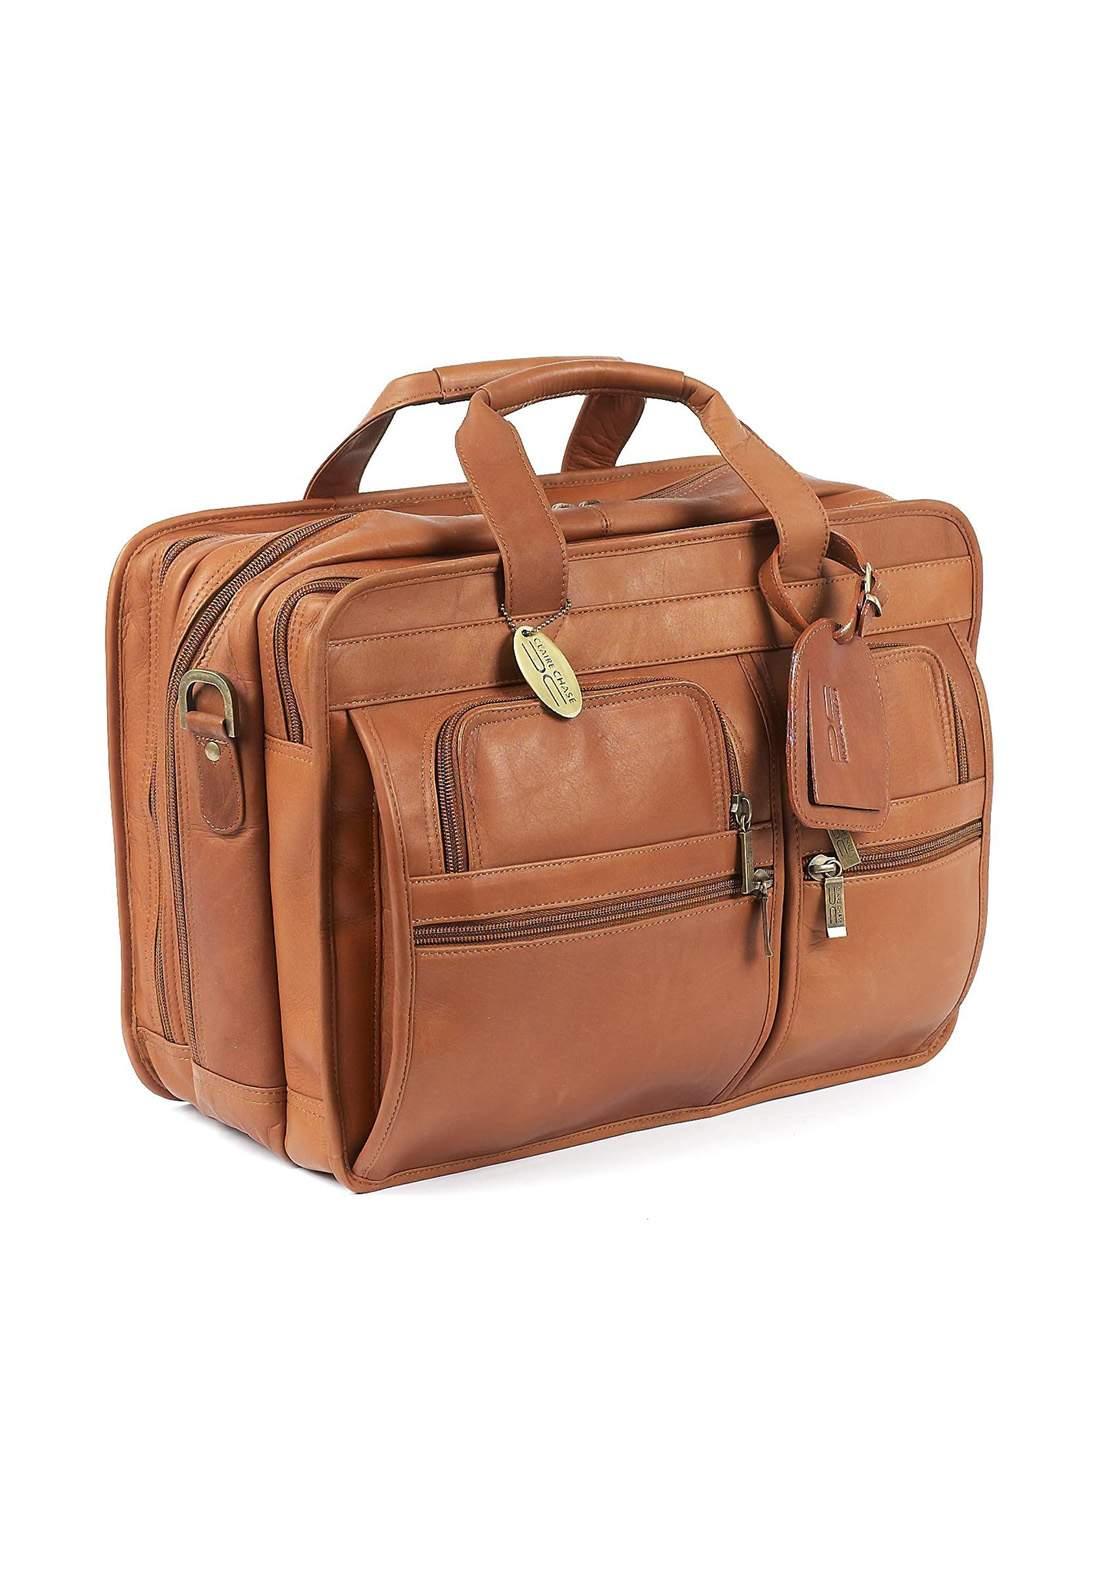 Claire Chase B004KTEPY4  Laptop Bag حقيبة لابتوب